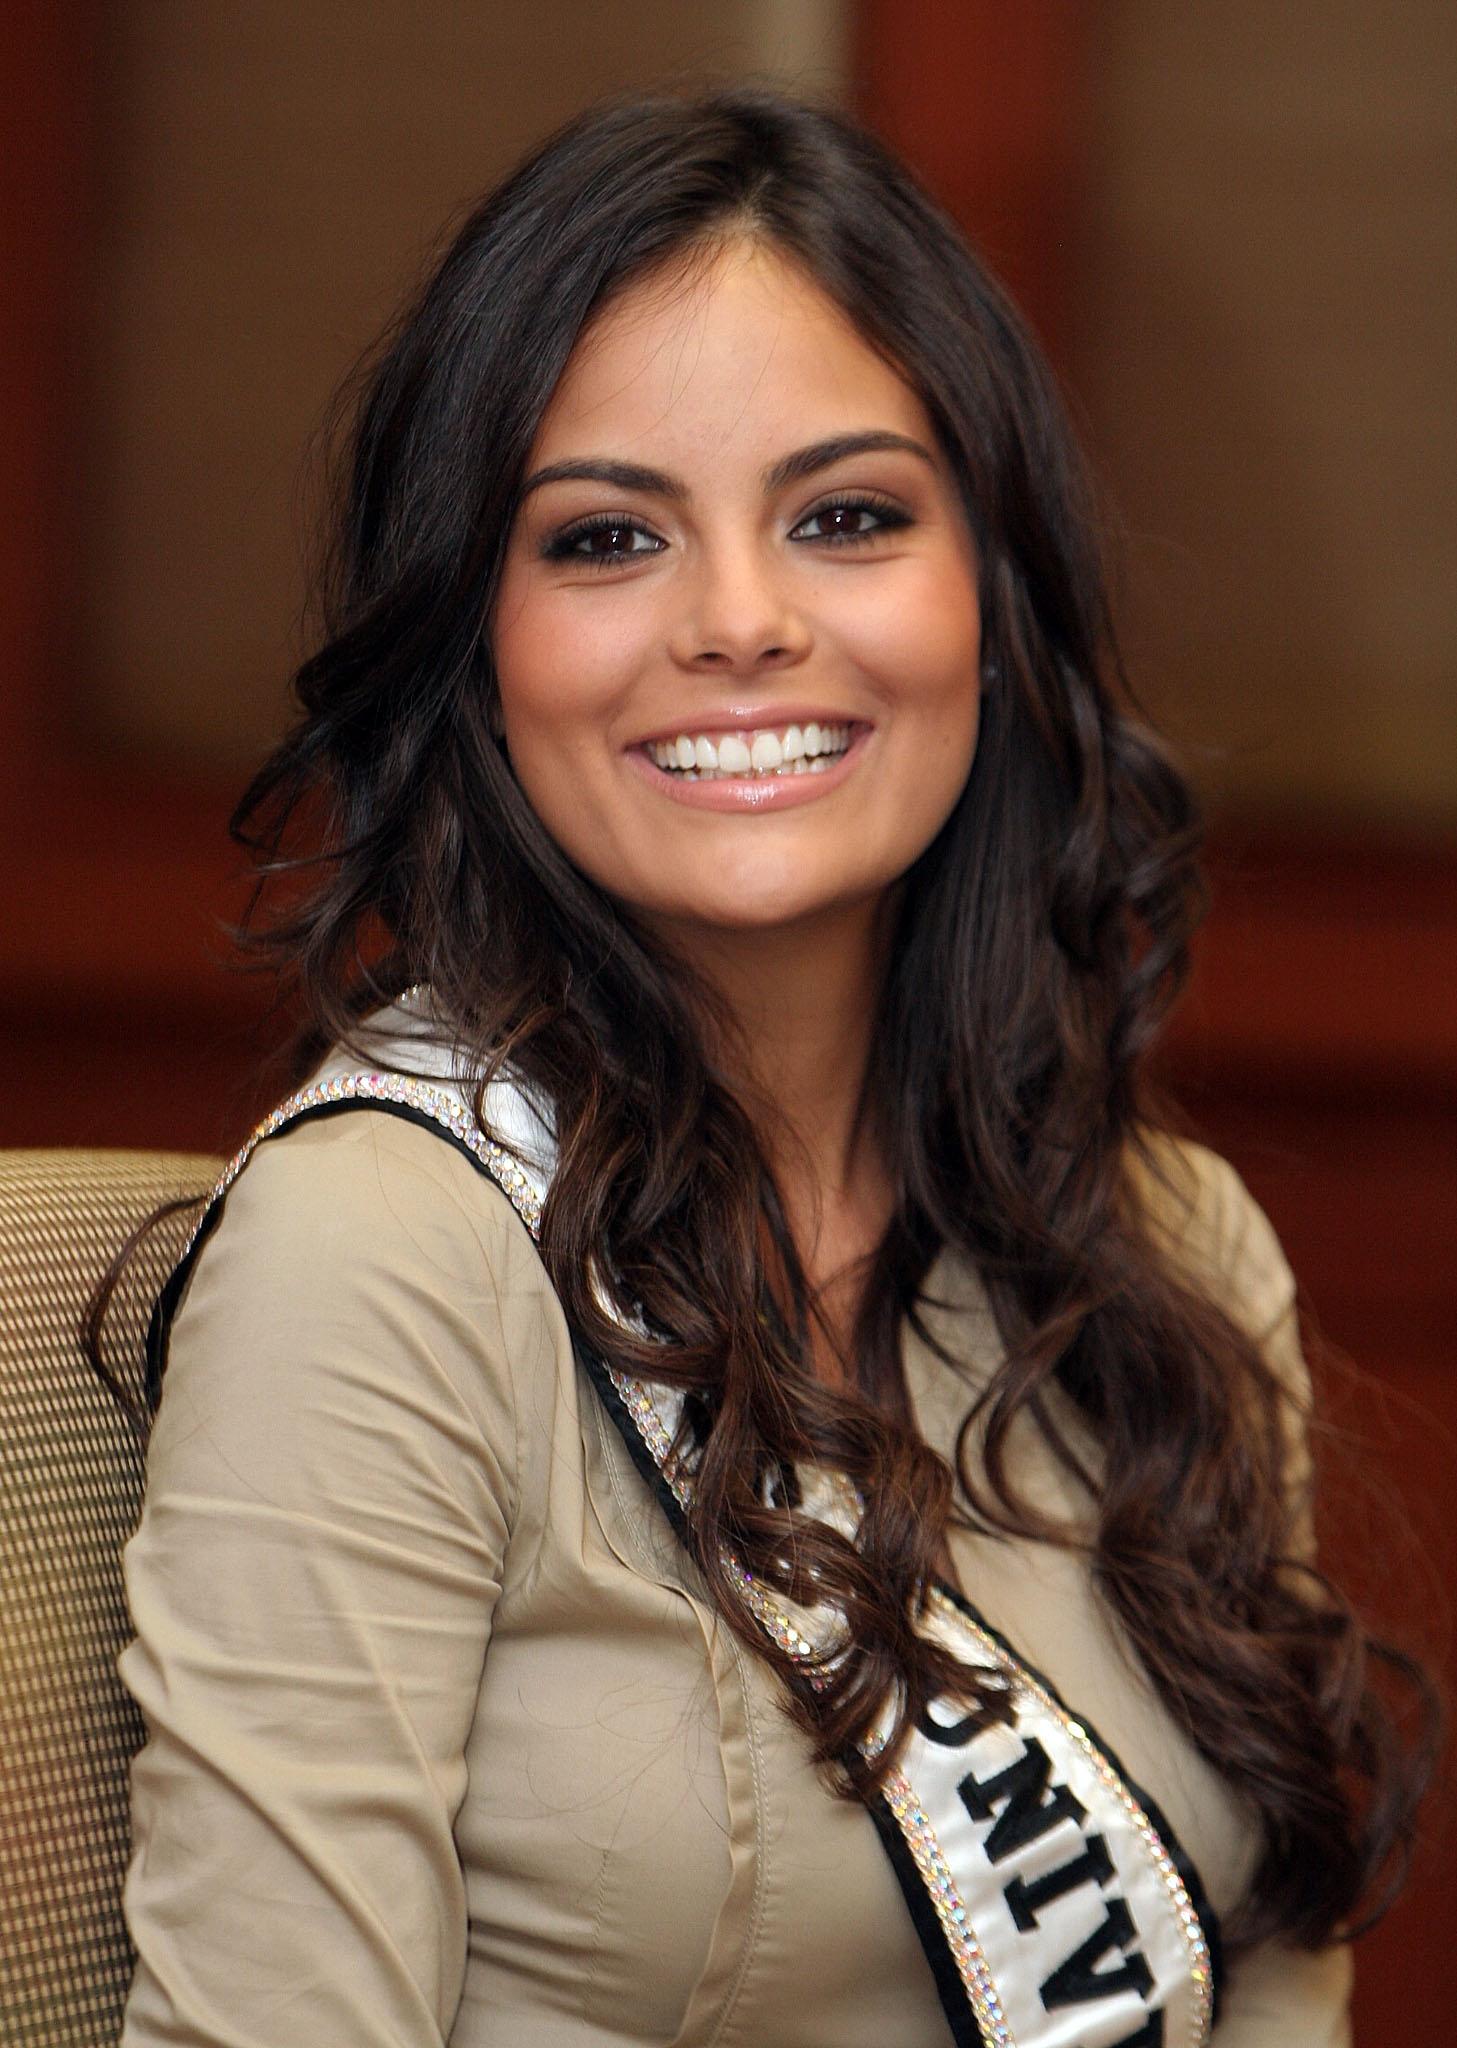 Ximena Navarrete Ximena_Navarrete_-_Miss_Universe_2010